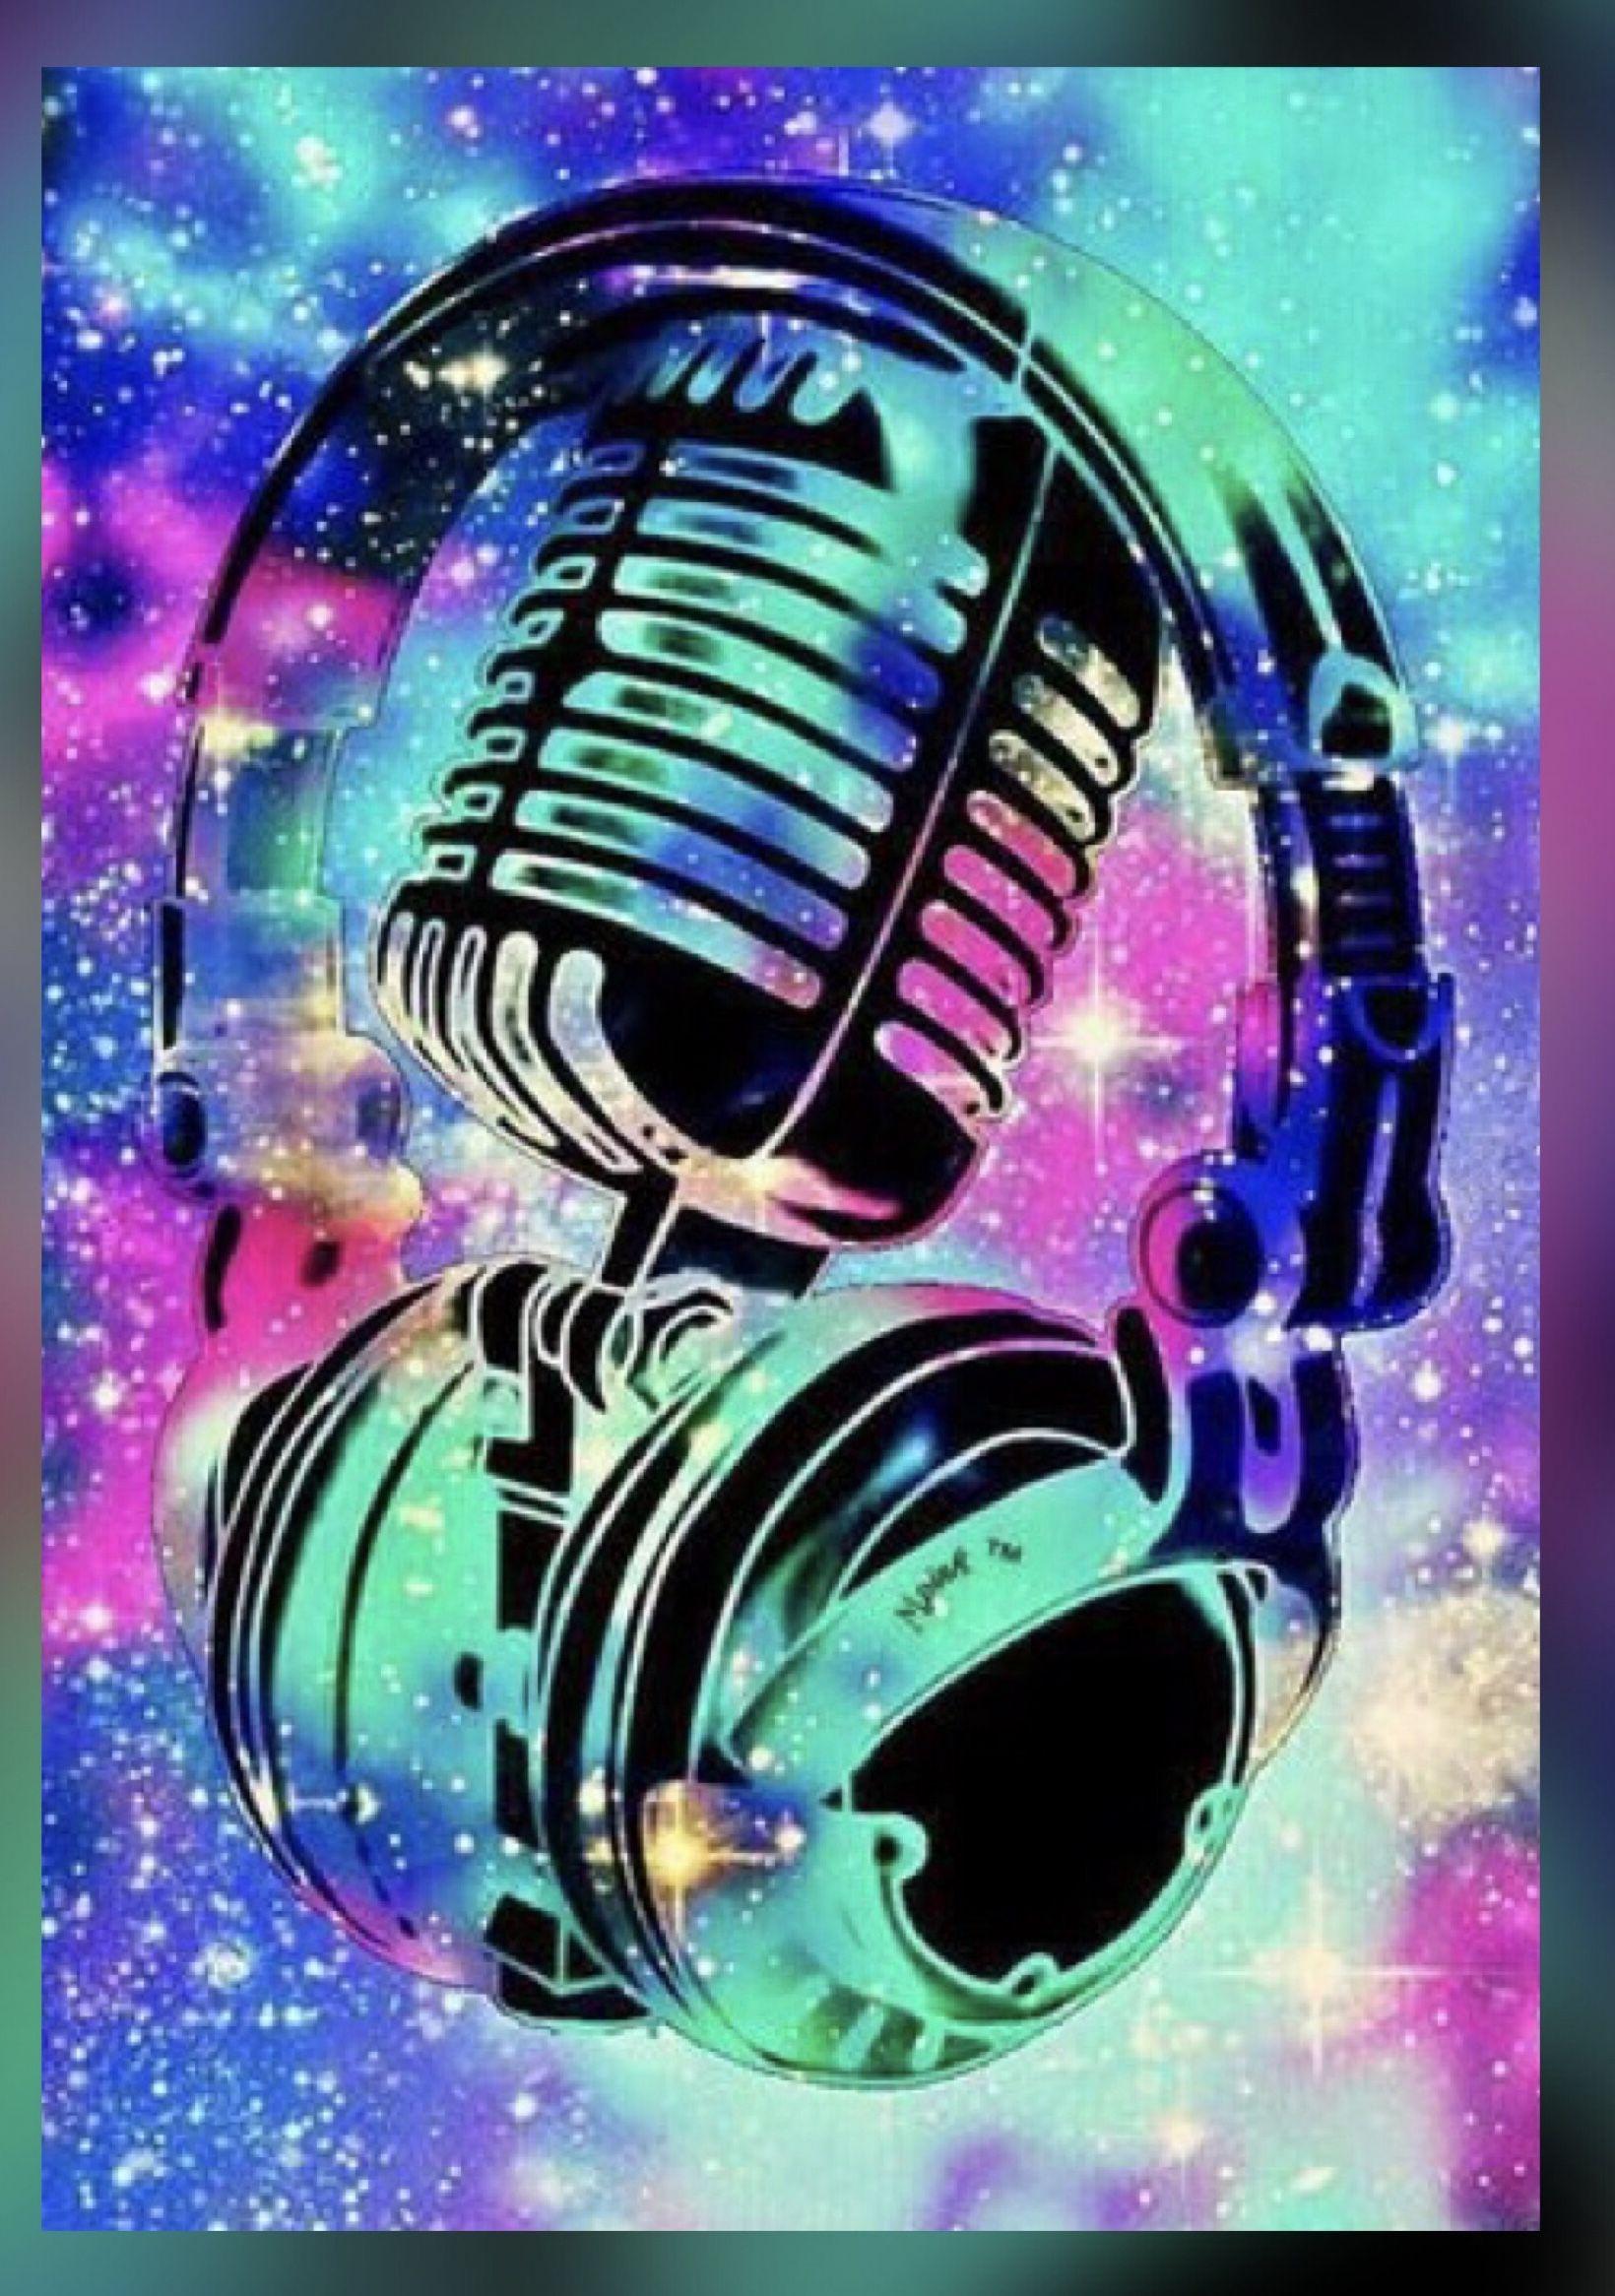 Cool Music Wallpaper